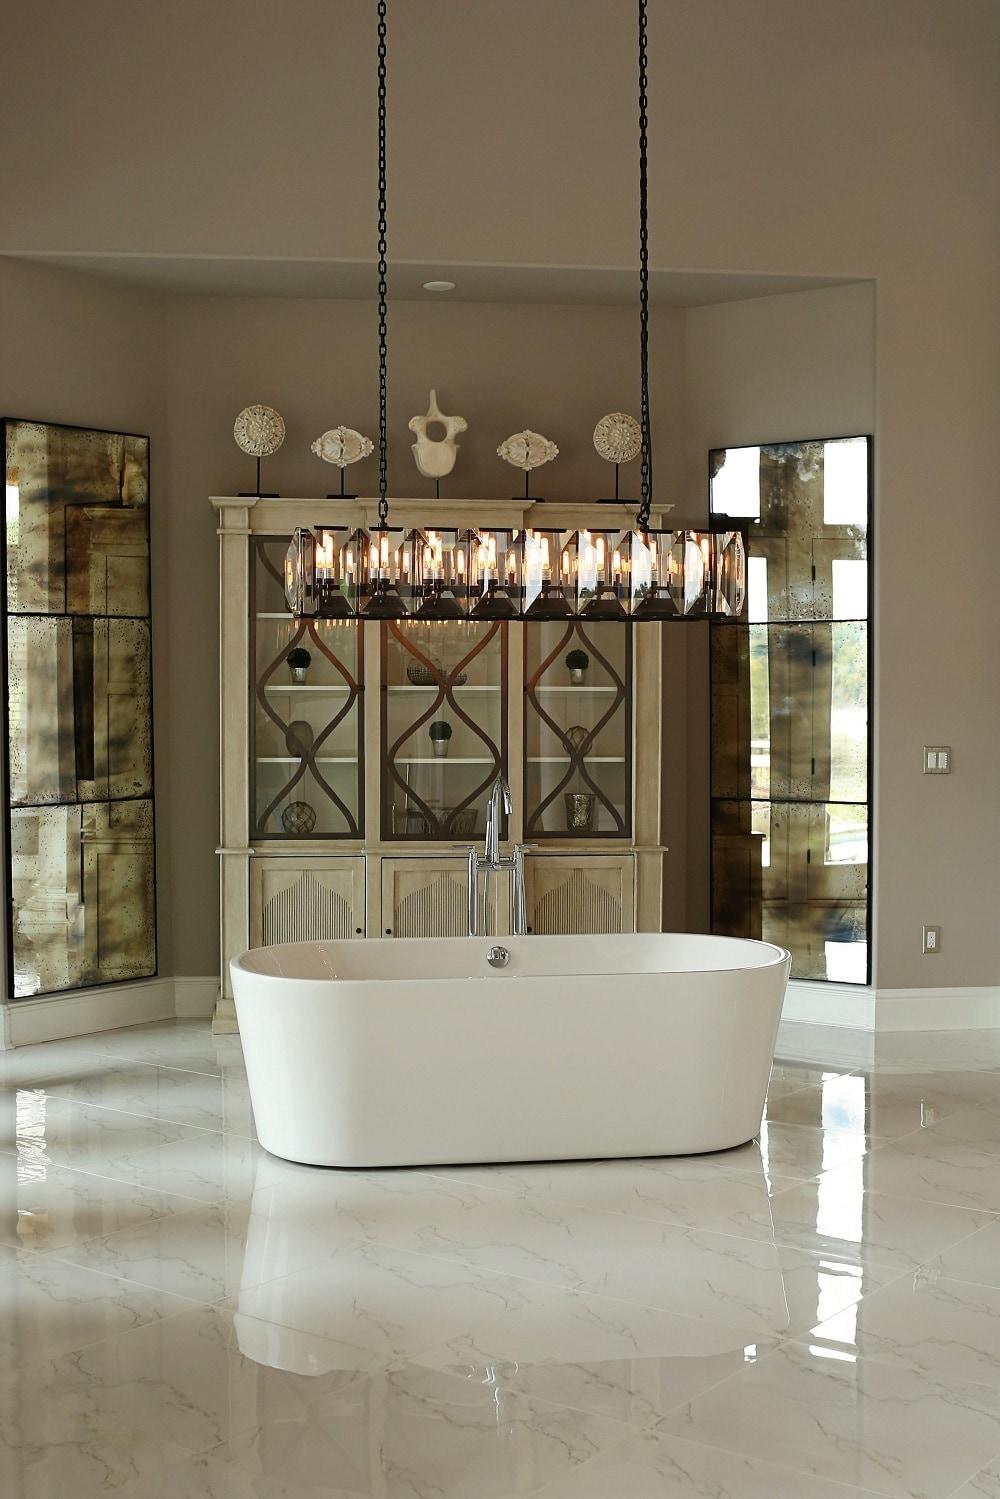 Pinnacle Bath Signature Bath/Freestanding Tubs Freestanding tubs ...